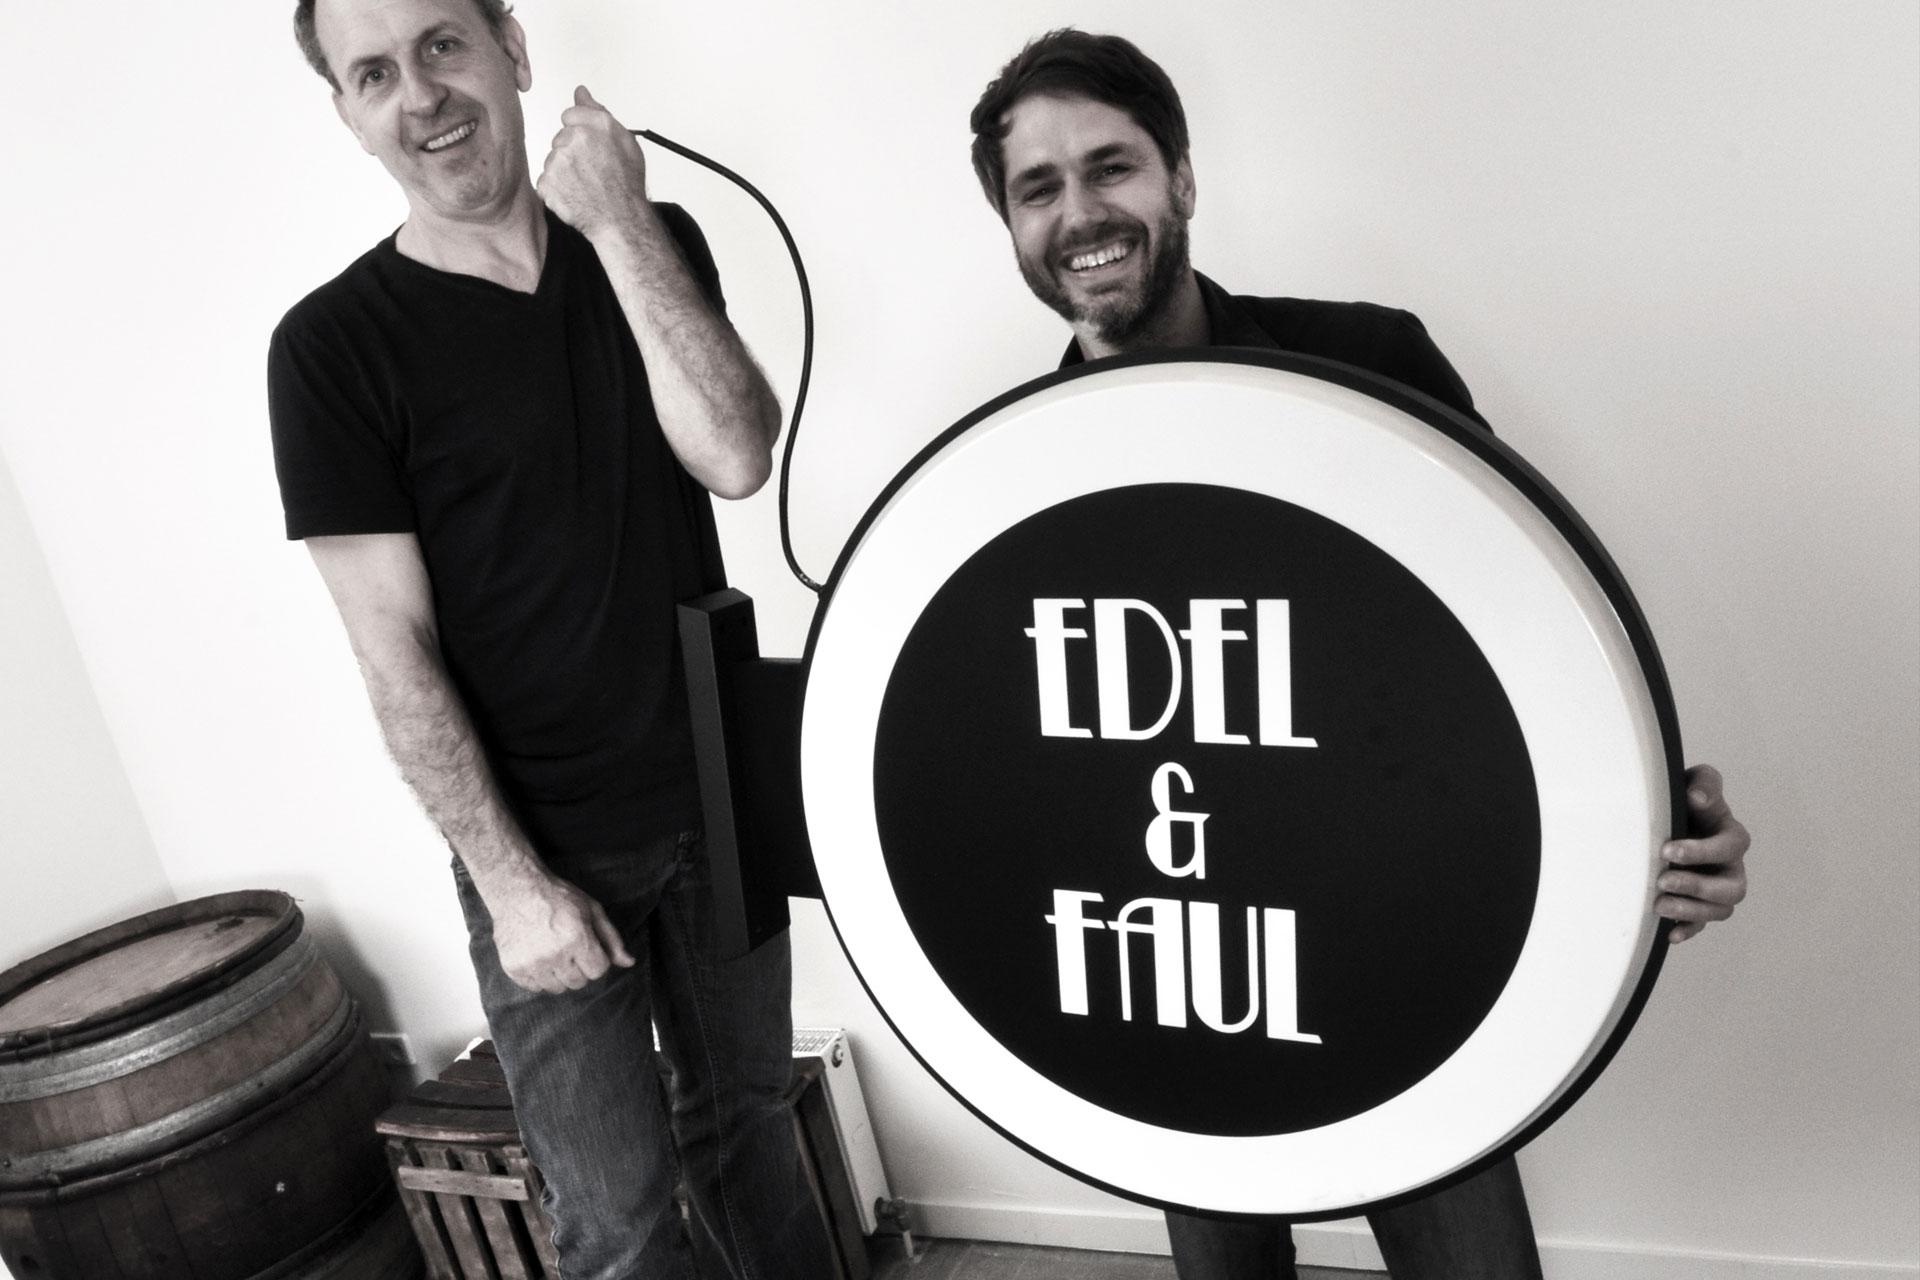 Edel & Faul